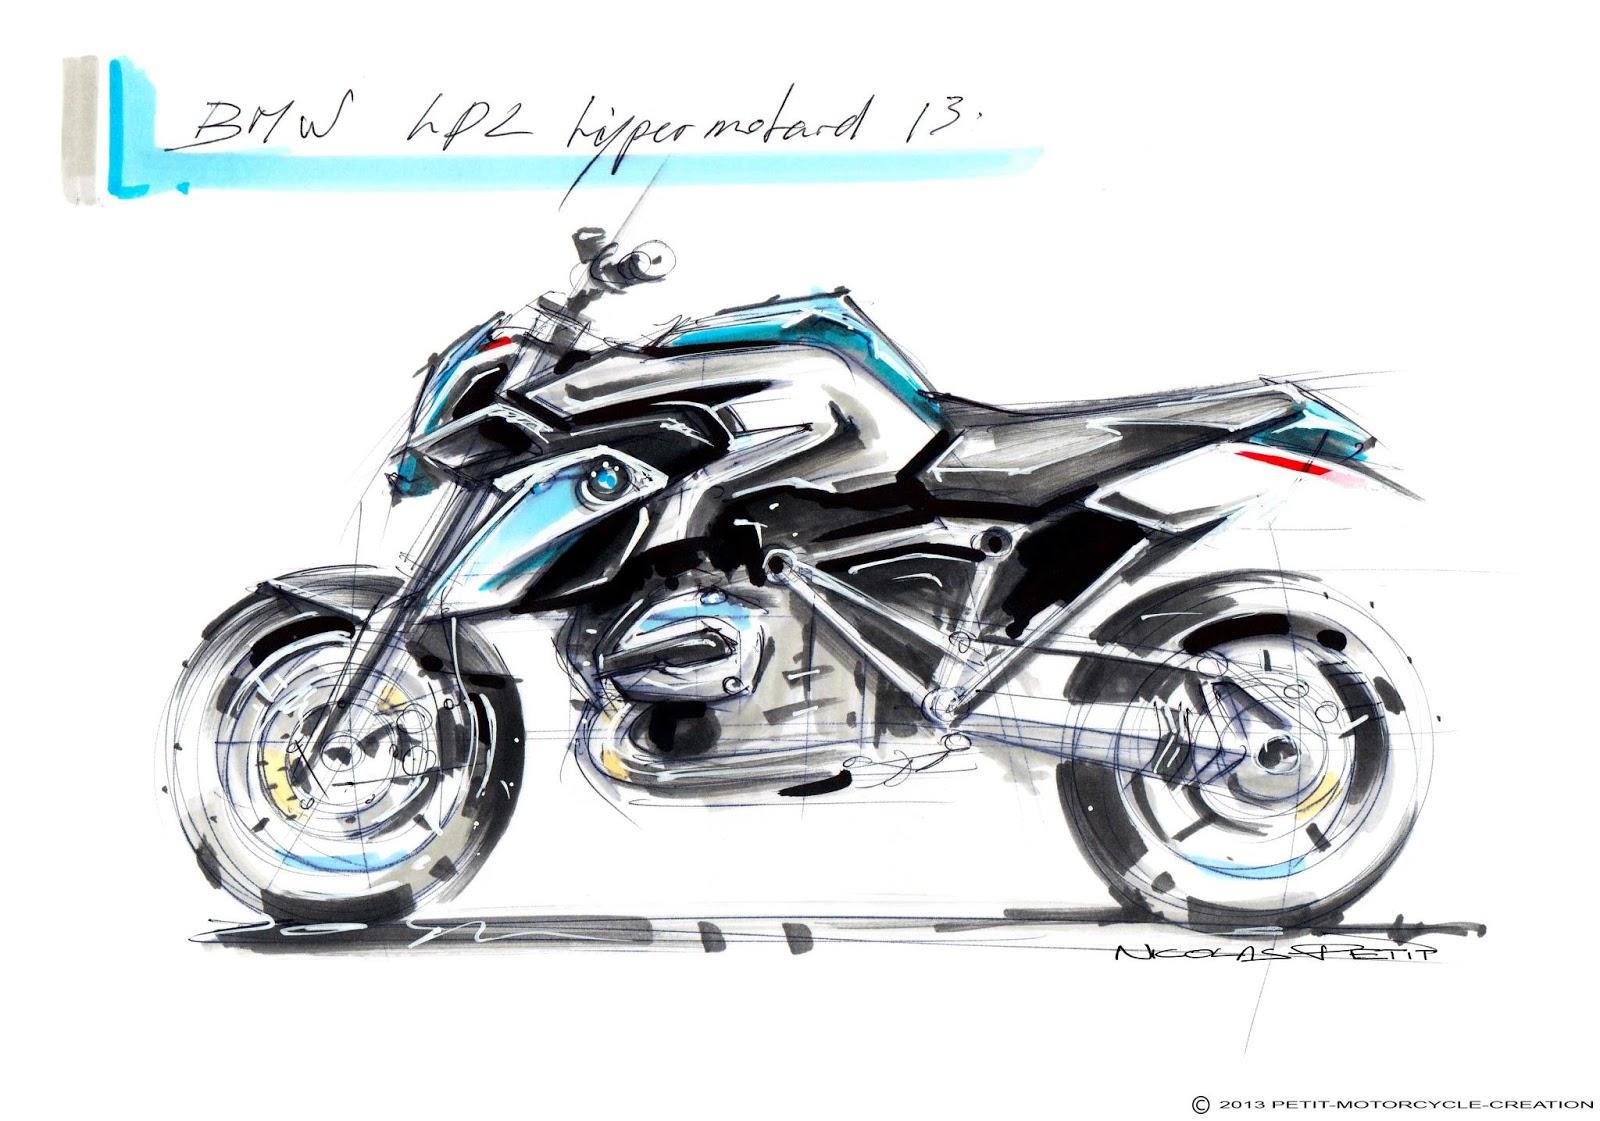 bmw-hp2-megamoto-lc.jpg